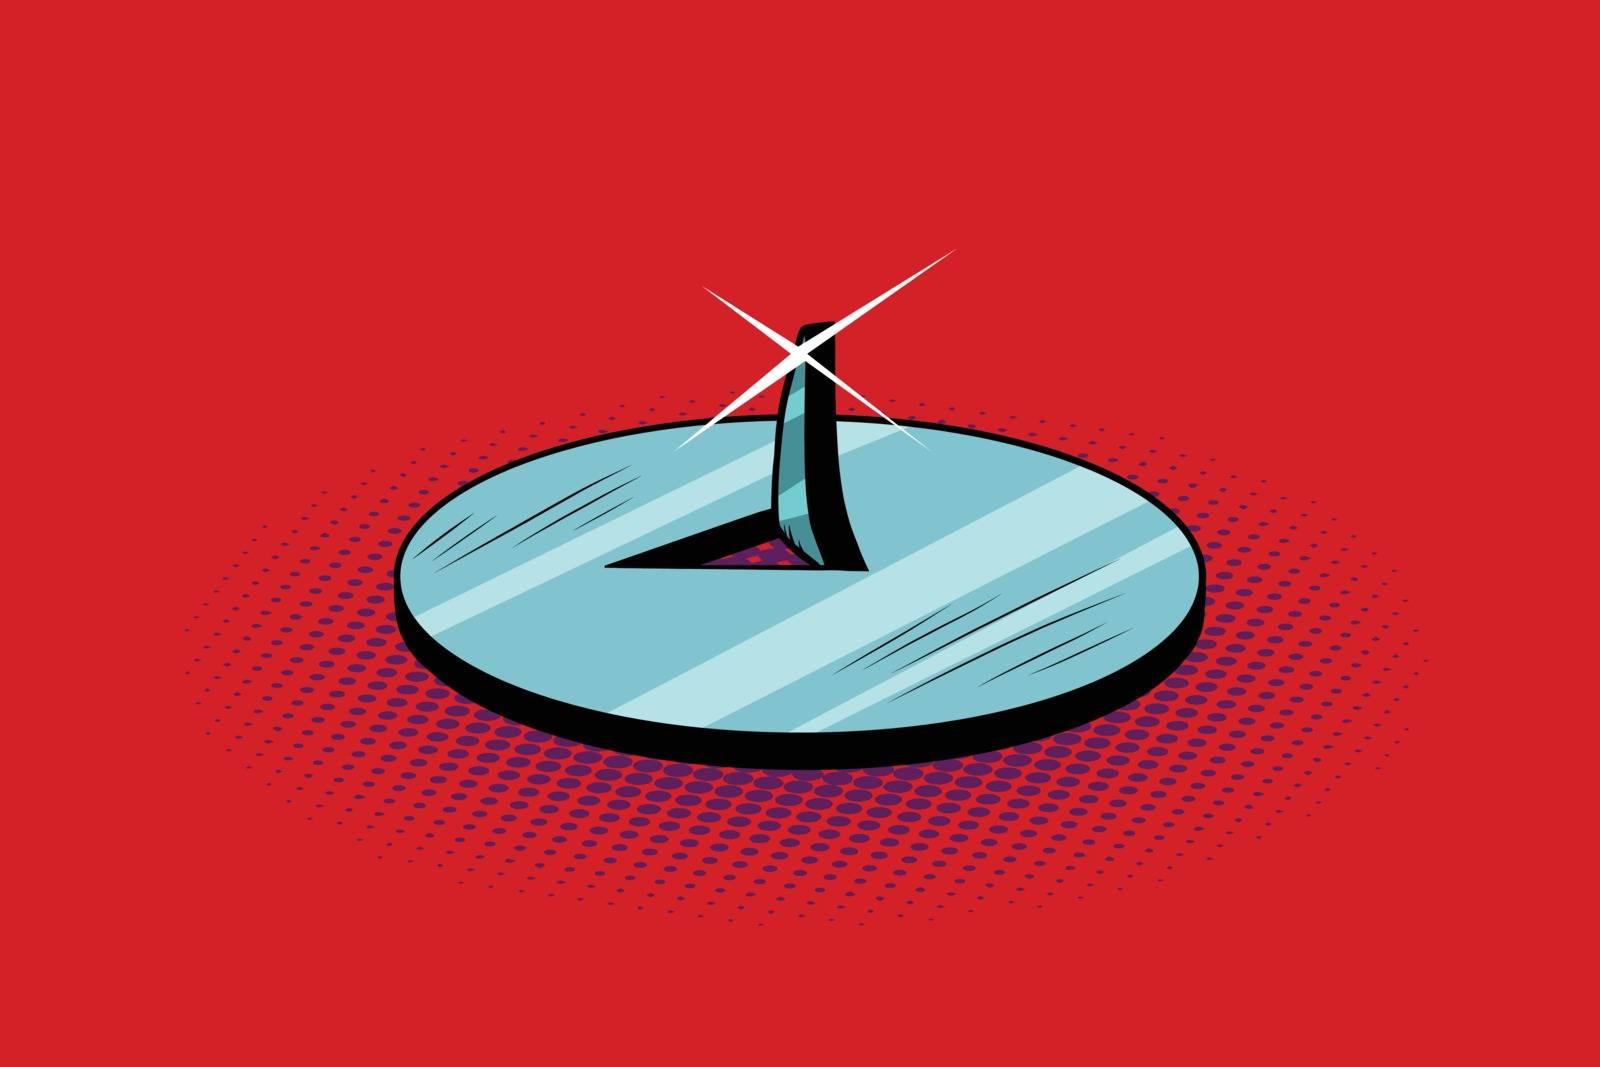 Pushpin sharp metal spike button, pop art retro vector illustration. Office supplies